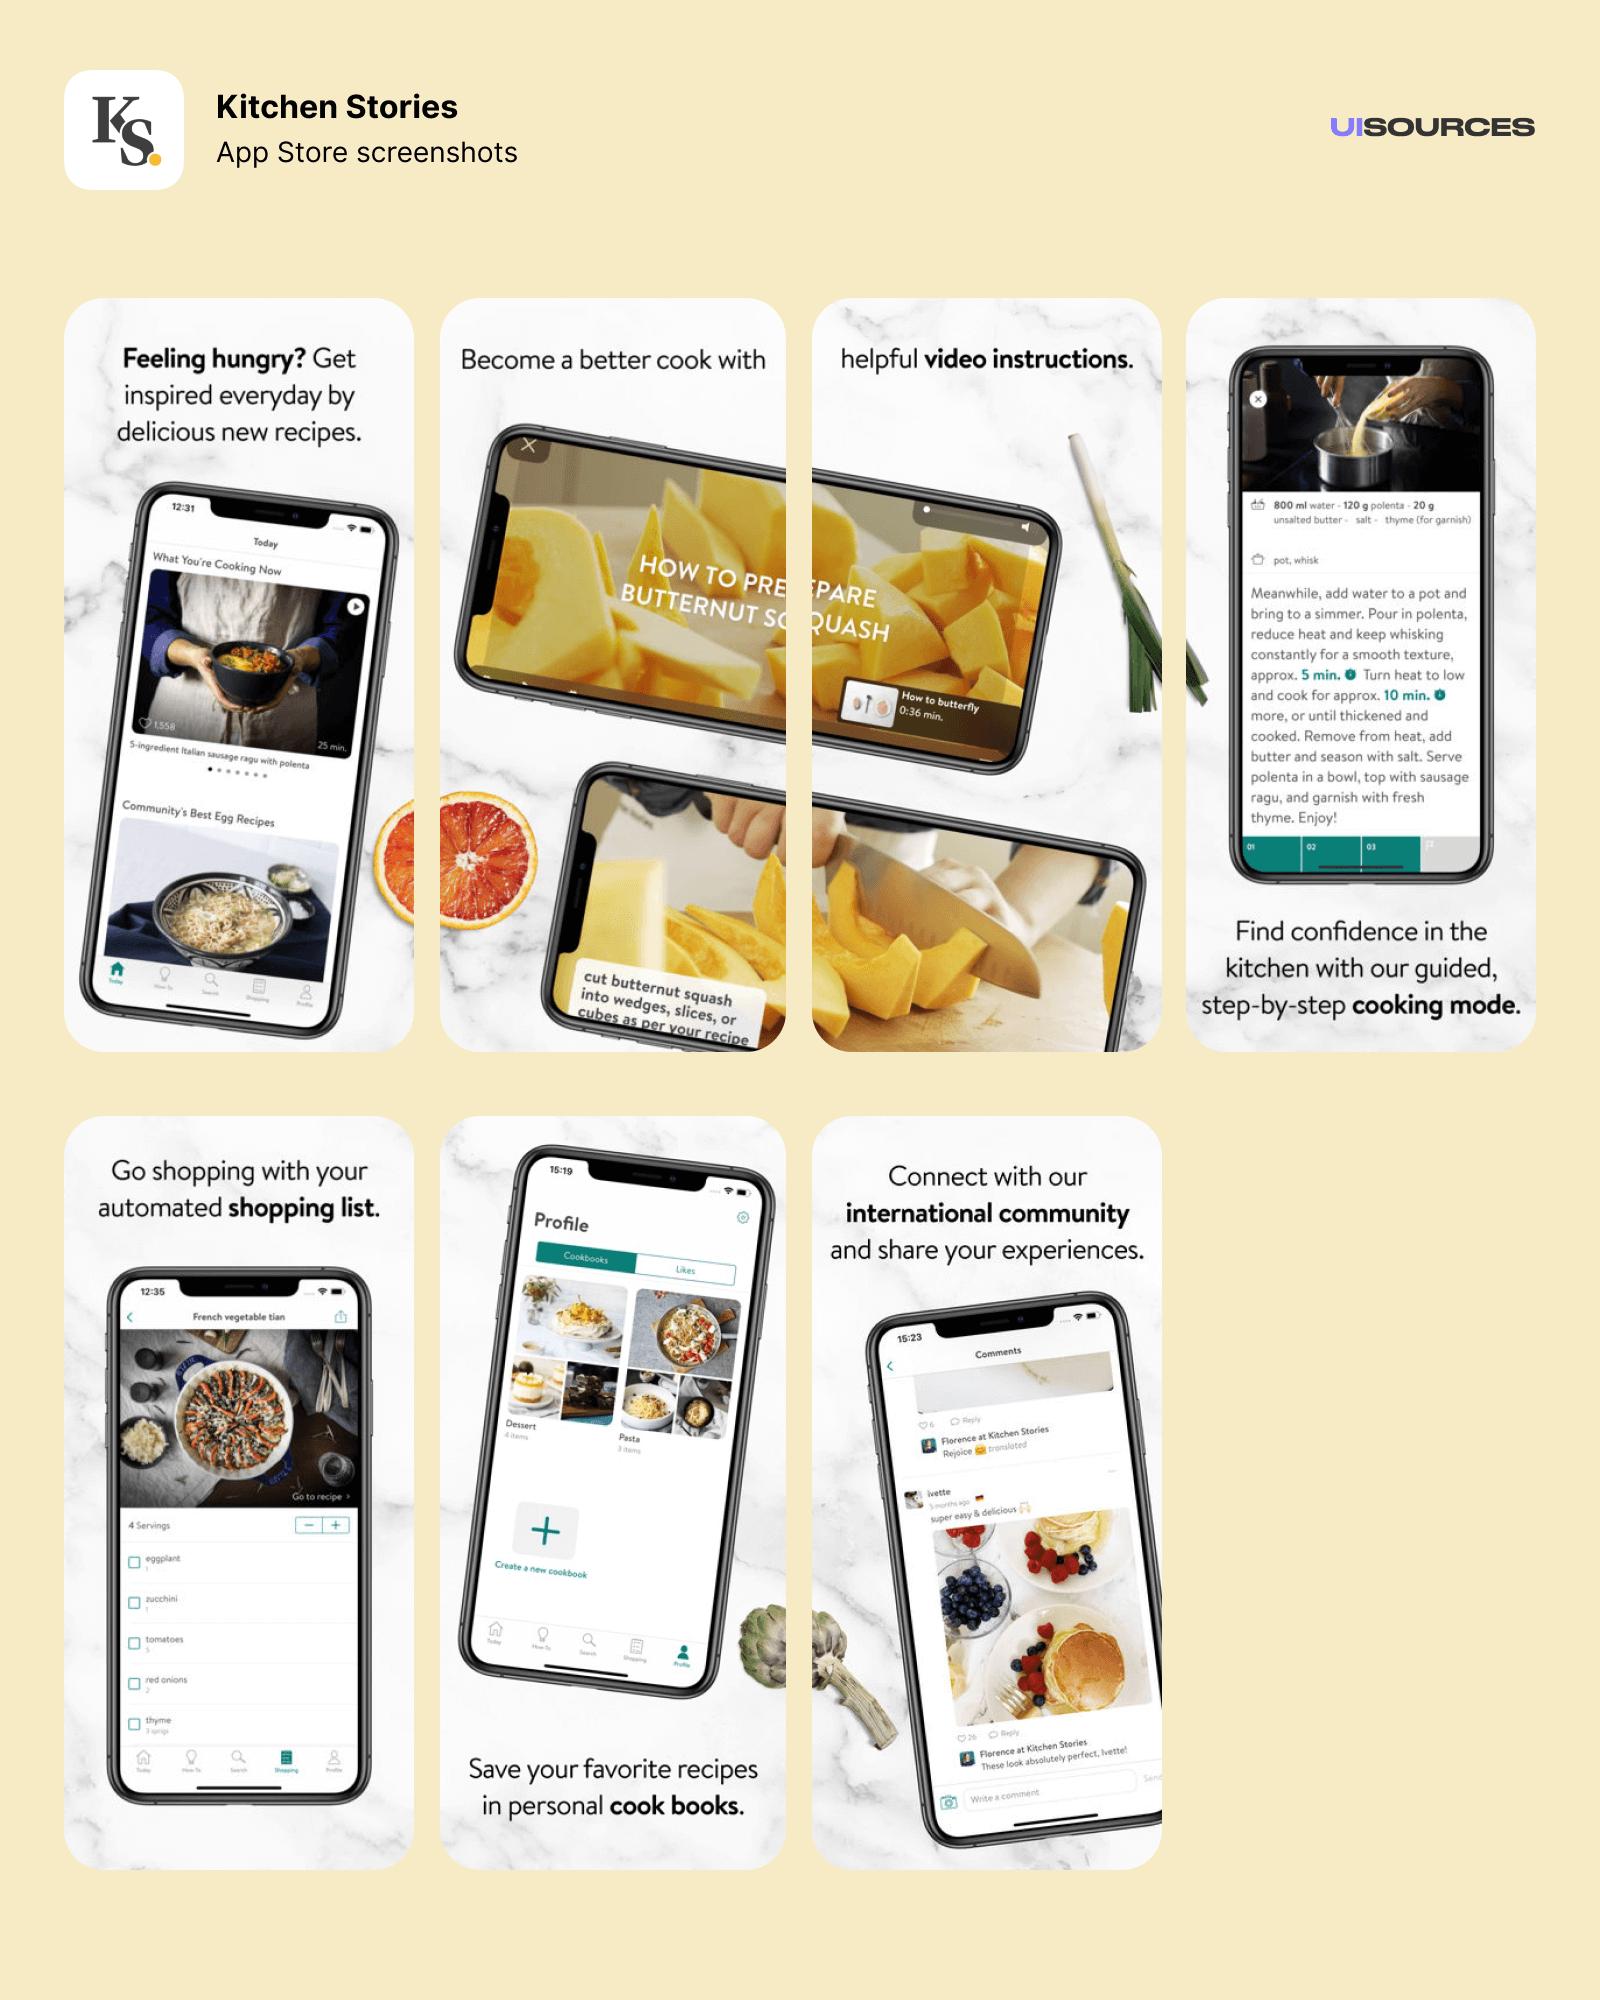 01 kitchen stories app store screenshots